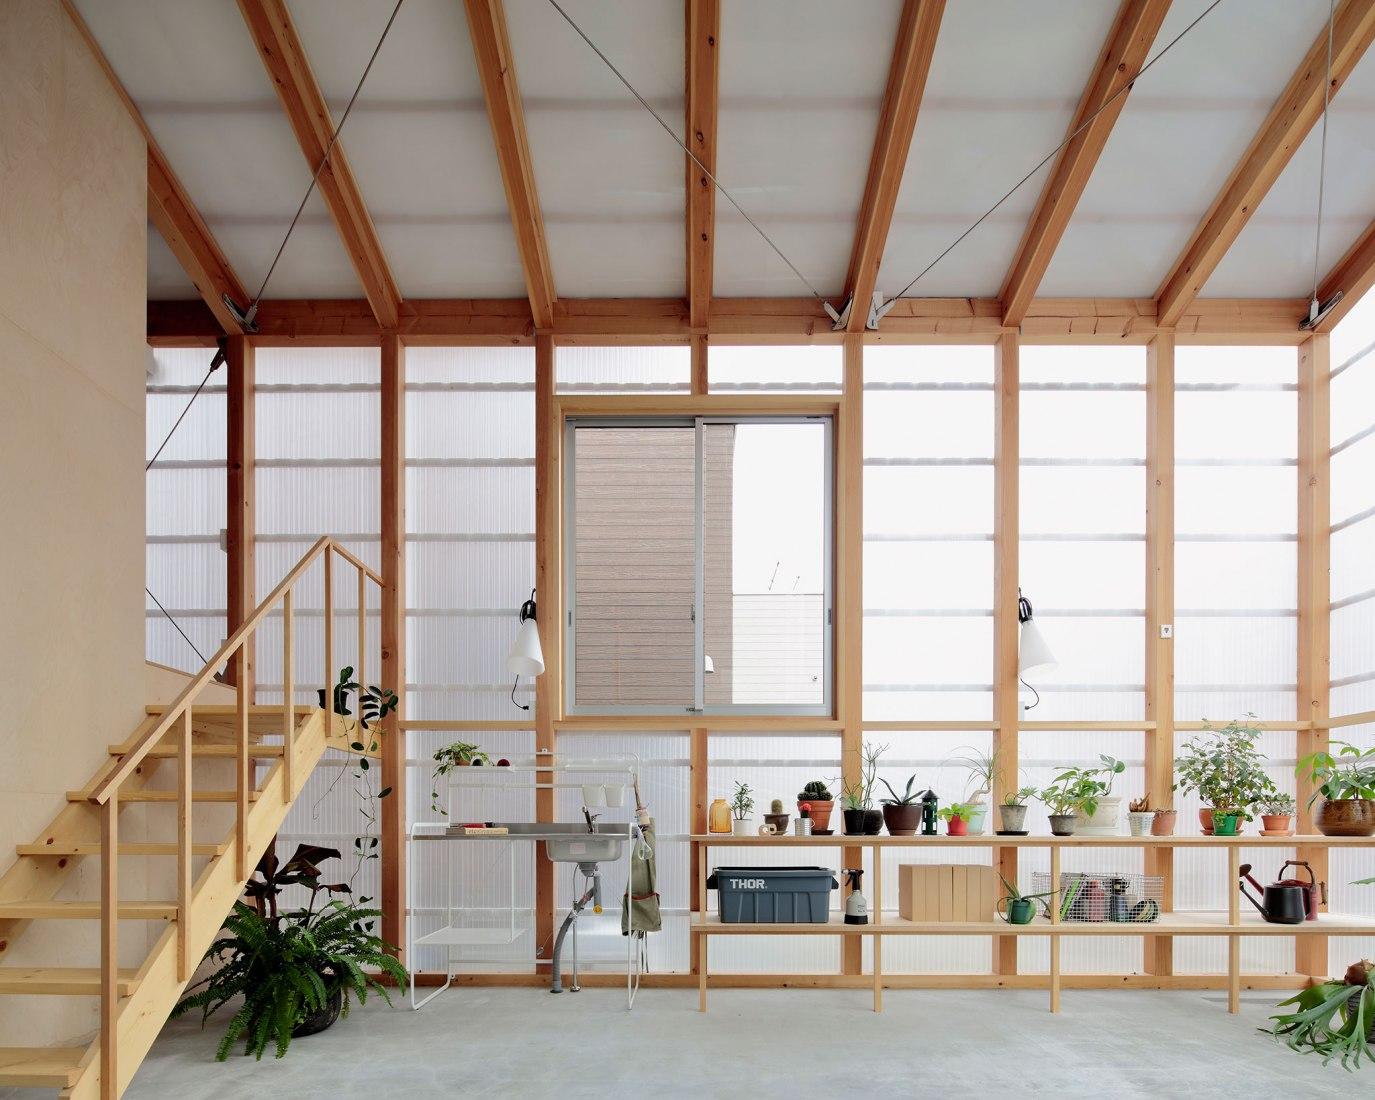 Inner Garden House por Takanori Ineyama Architects. Fotografía por Koichi Torimura.